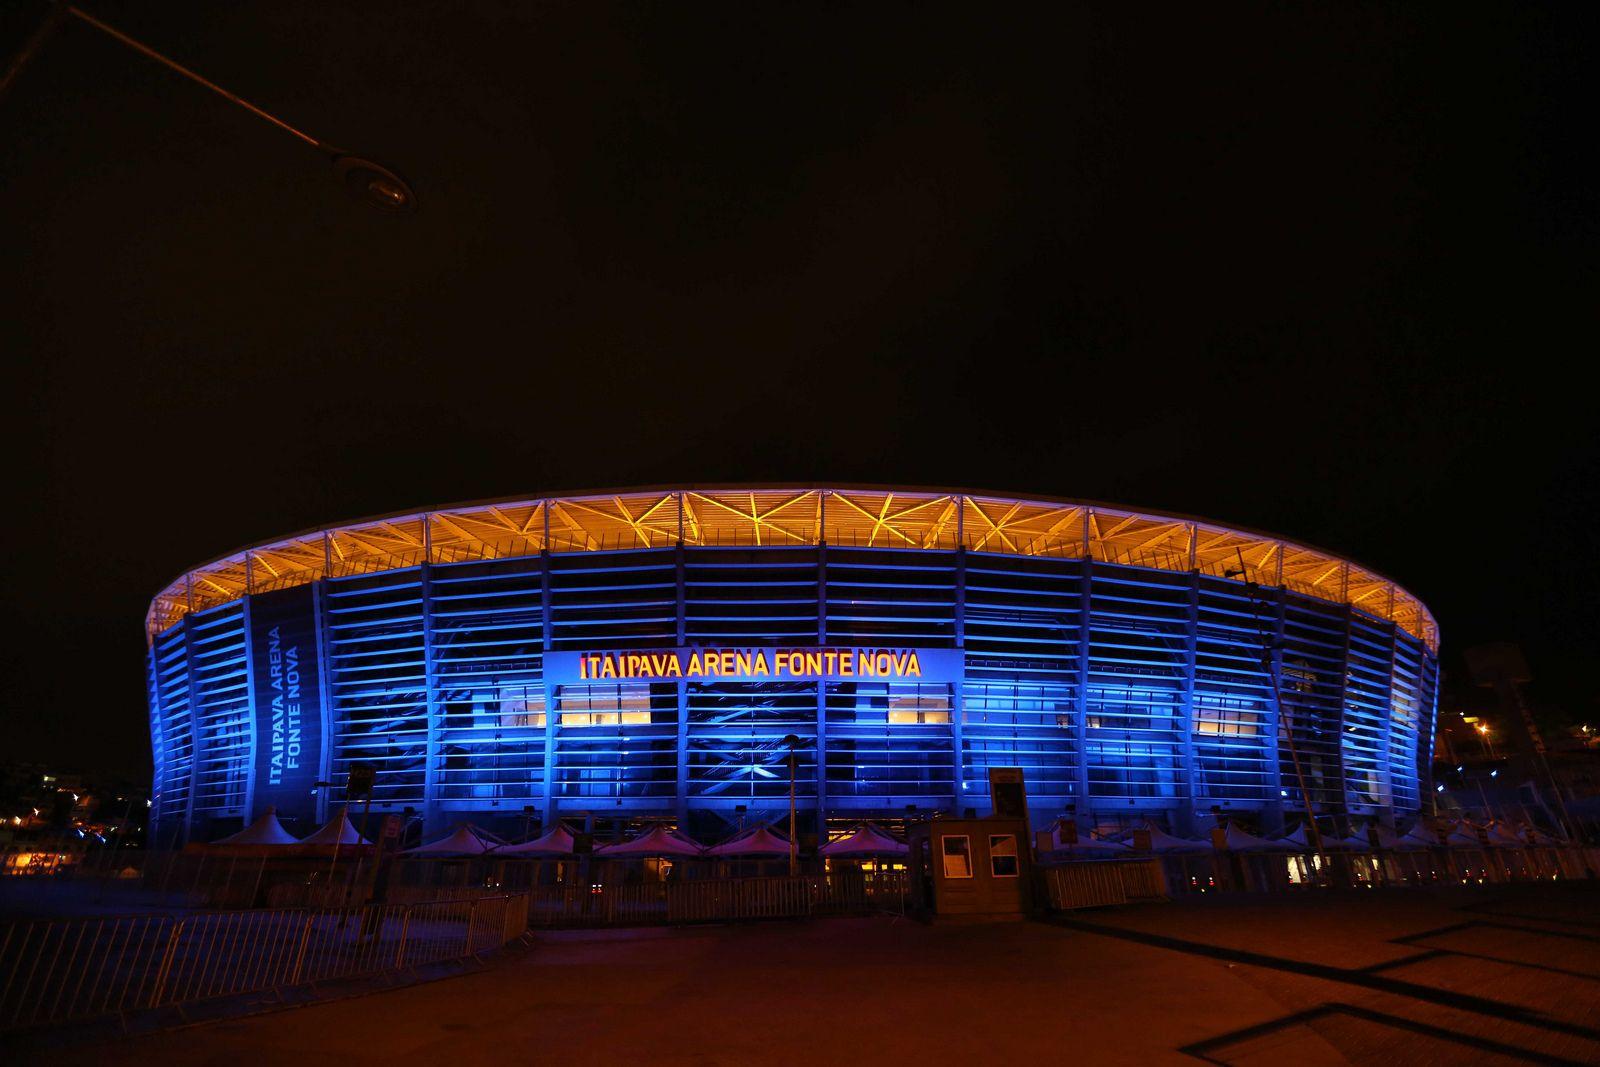 Itaipava Arena Fonte Nova - Itaipava Arena Fonte Nova